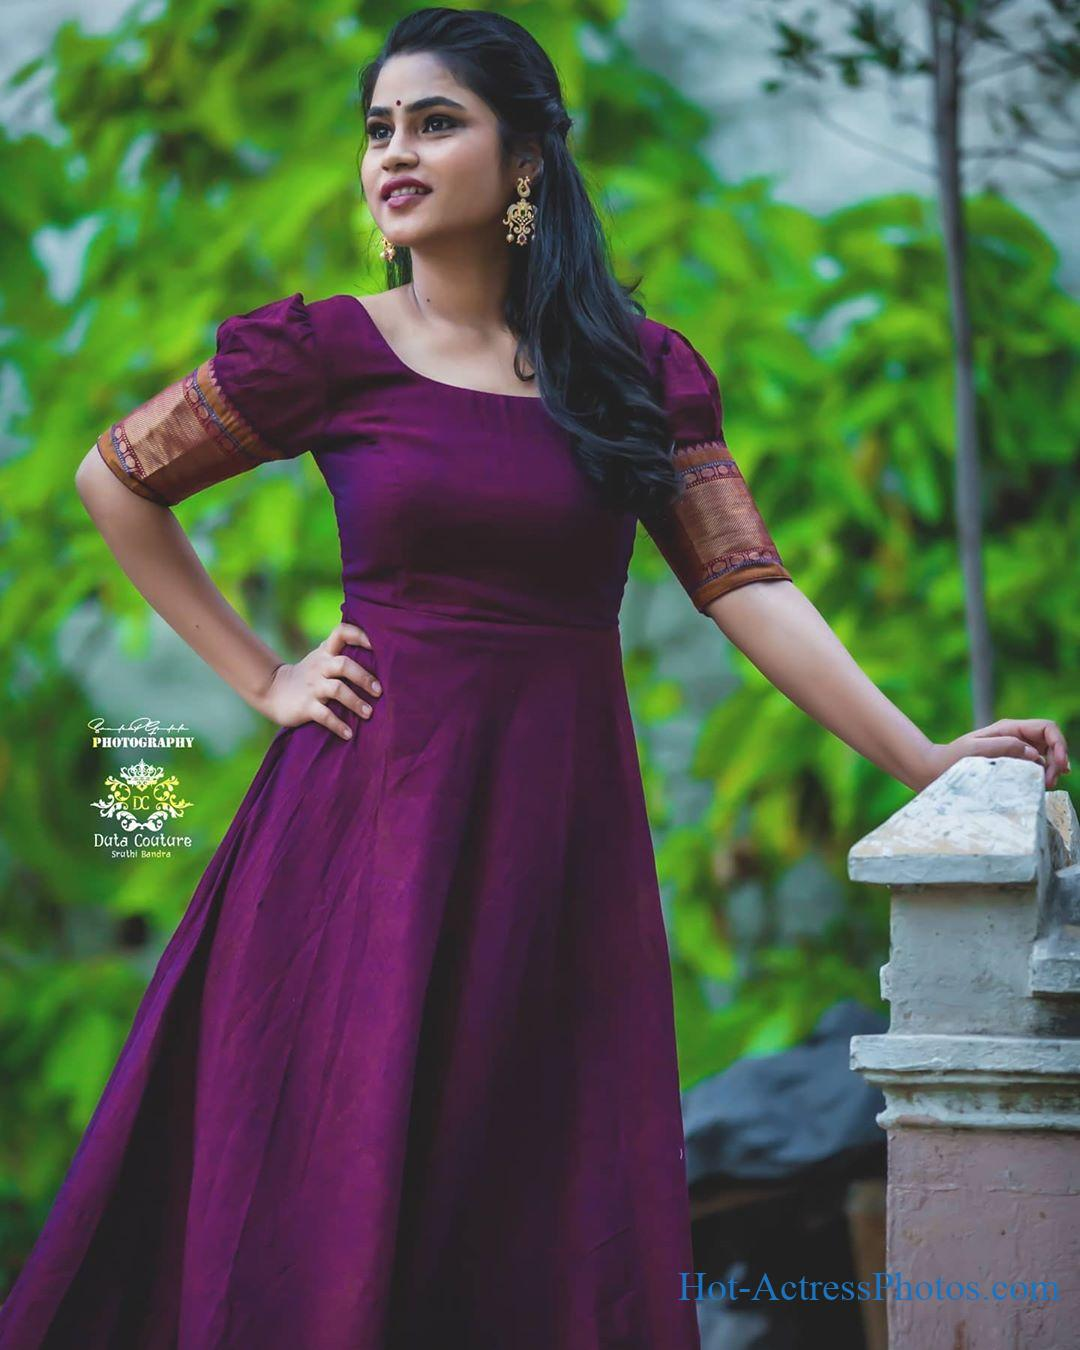 Model Sowmya Dhanavath New Cute Photoshoot Images